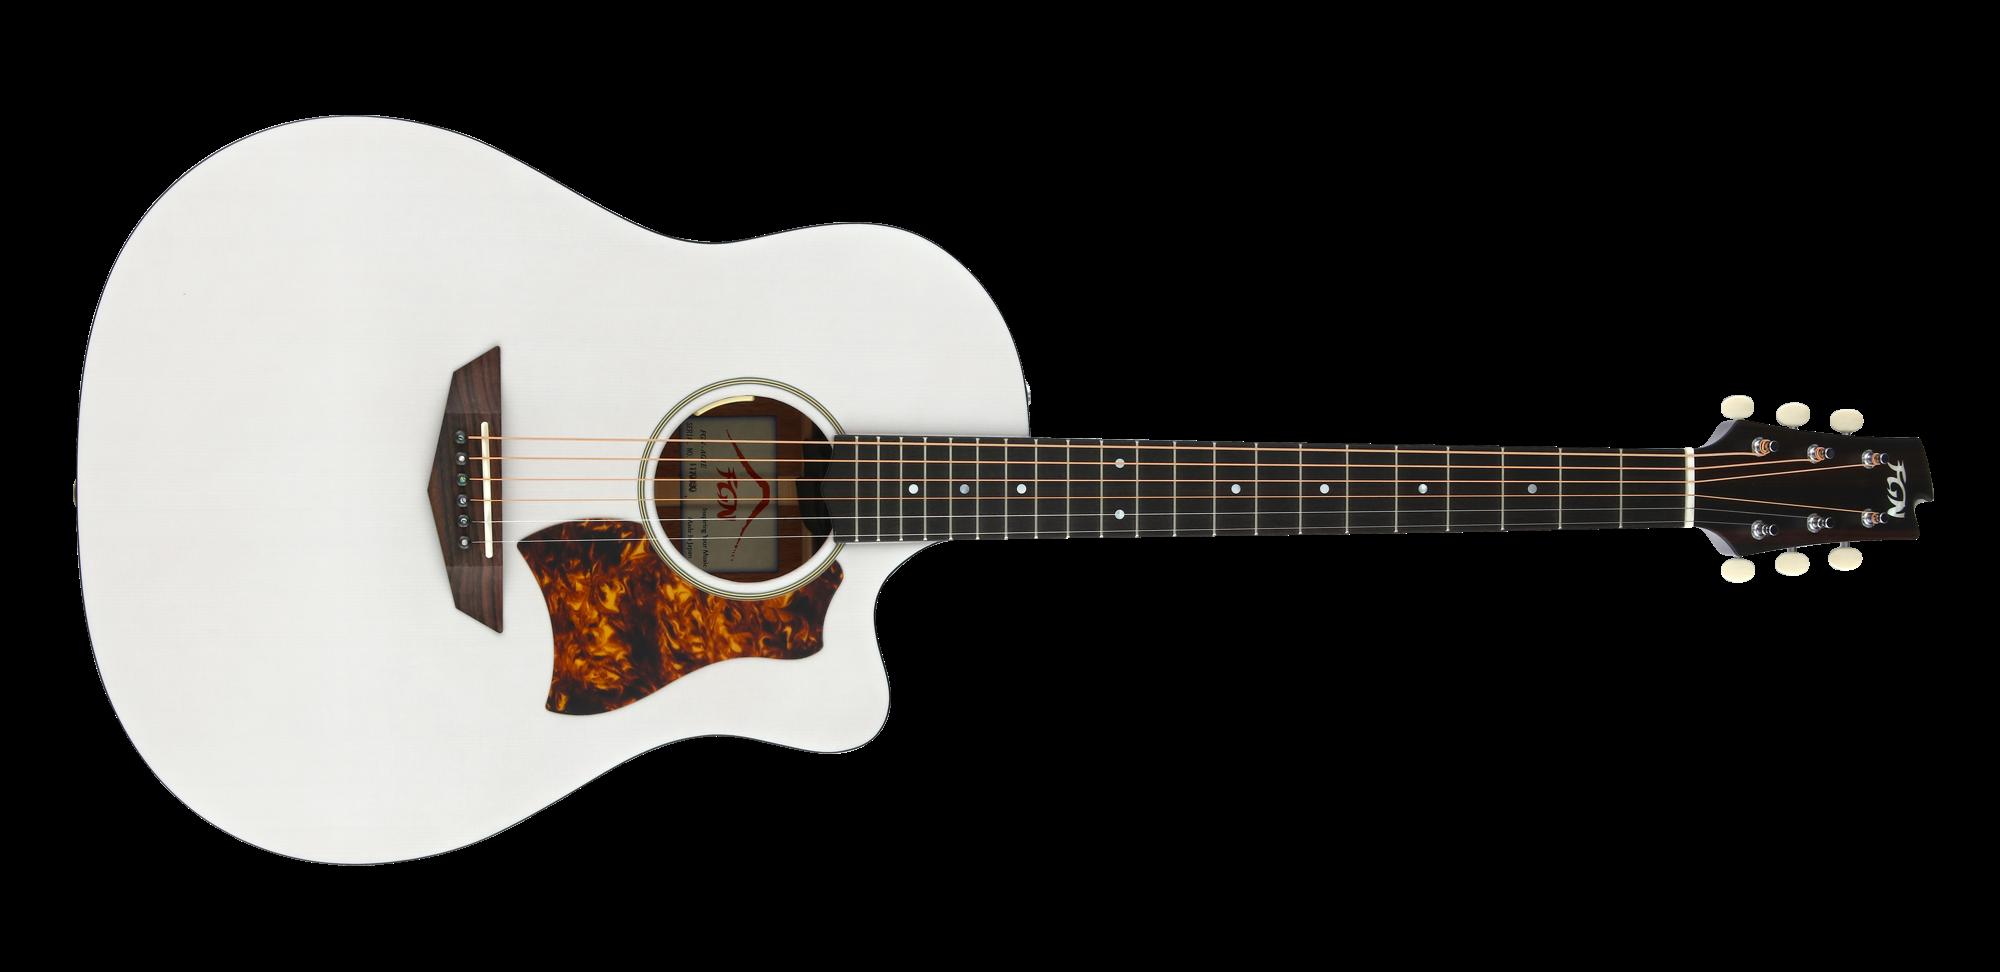 FGN Westerngitarre, AG1E, Transparent White Flat, Preamp, Tasche